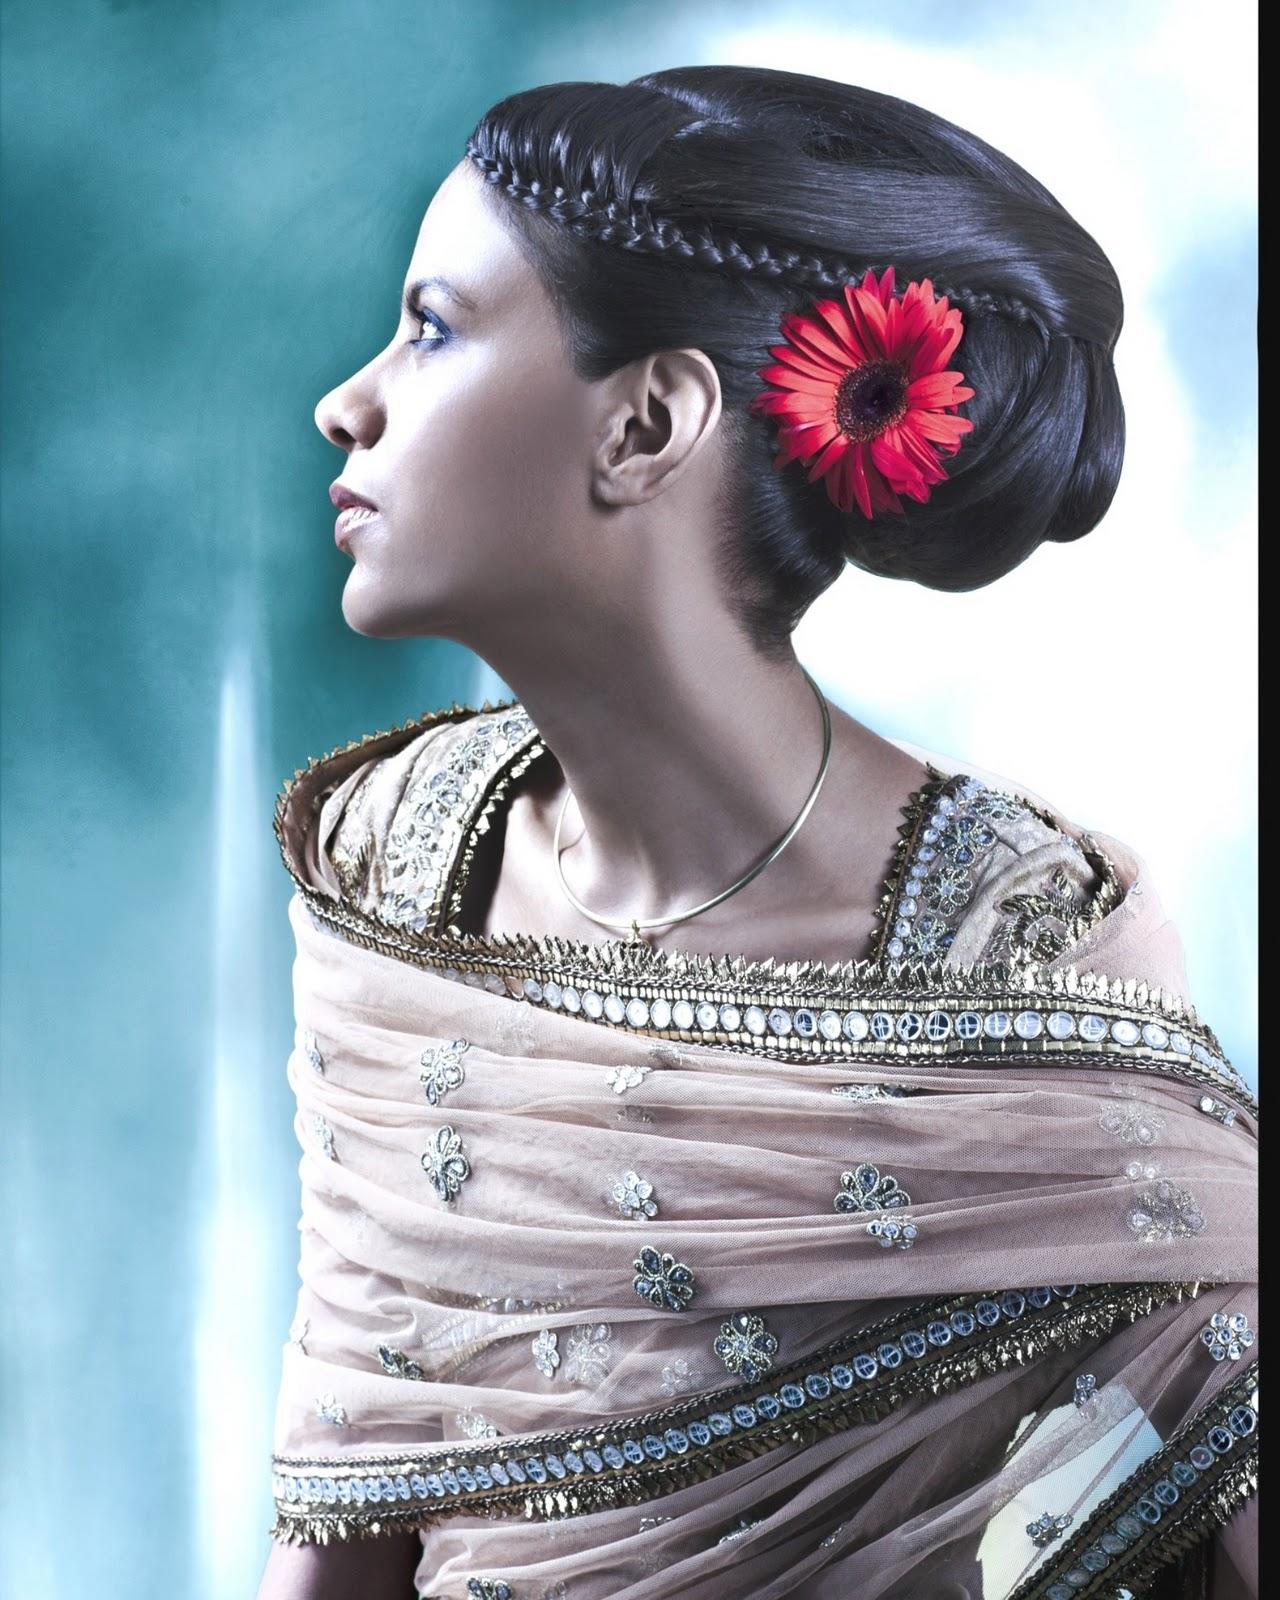 http://3.bp.blogspot.com/-7B97MjZBaFQ/TvCTcklM_HI/AAAAAAAADC0/DBOnRowjTig/s1600/bespoke+bridal+look+-+1.jpg